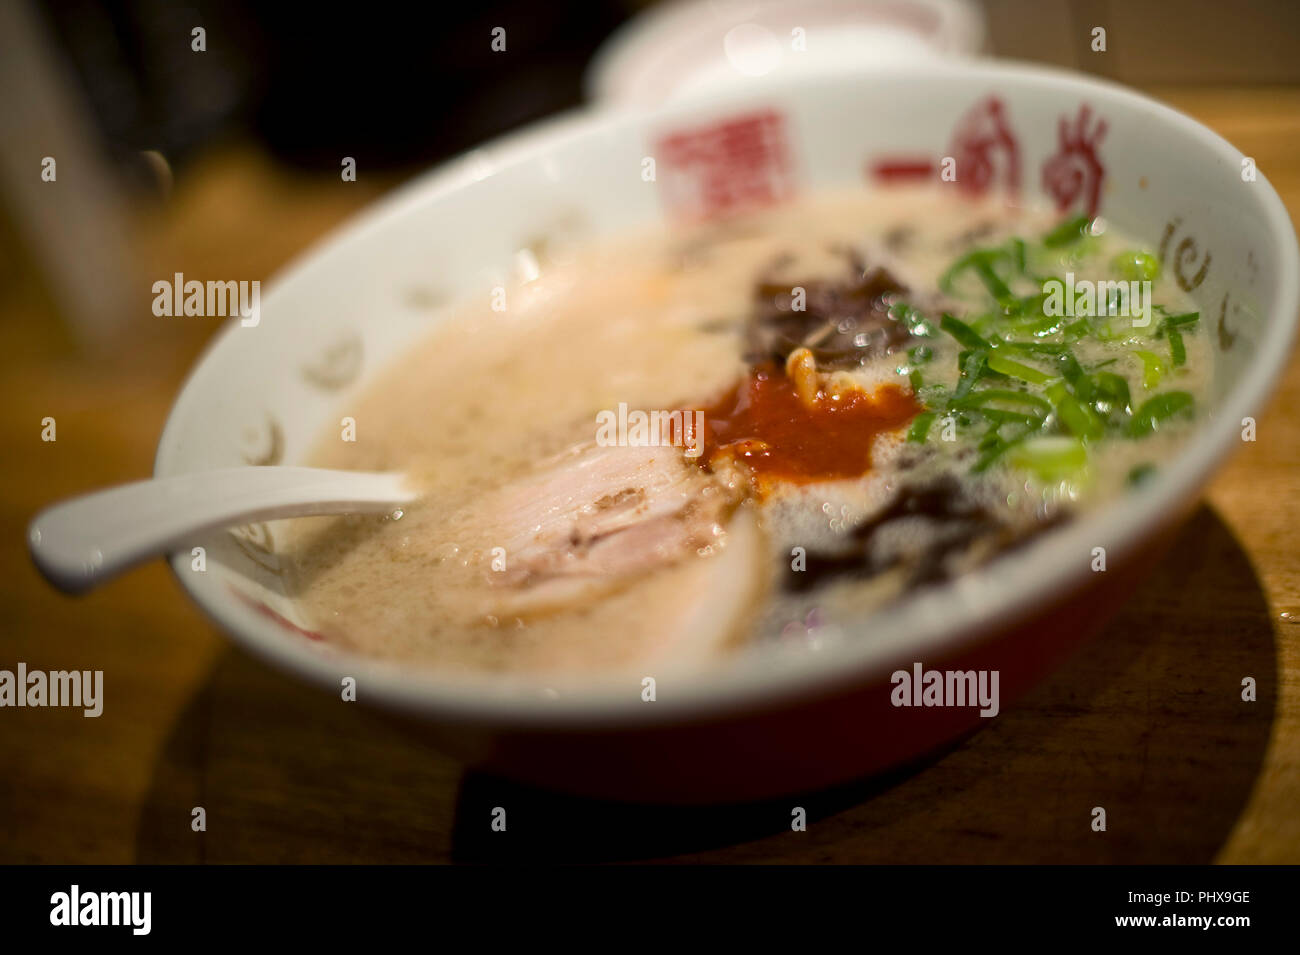 Photo shows soup noodles prepared at Hakata Ippudo Ramen's main store in the Daimyo district of Fukuoka City, Fukuoka Prefecture Japan on 08 March 201 - Stock Image